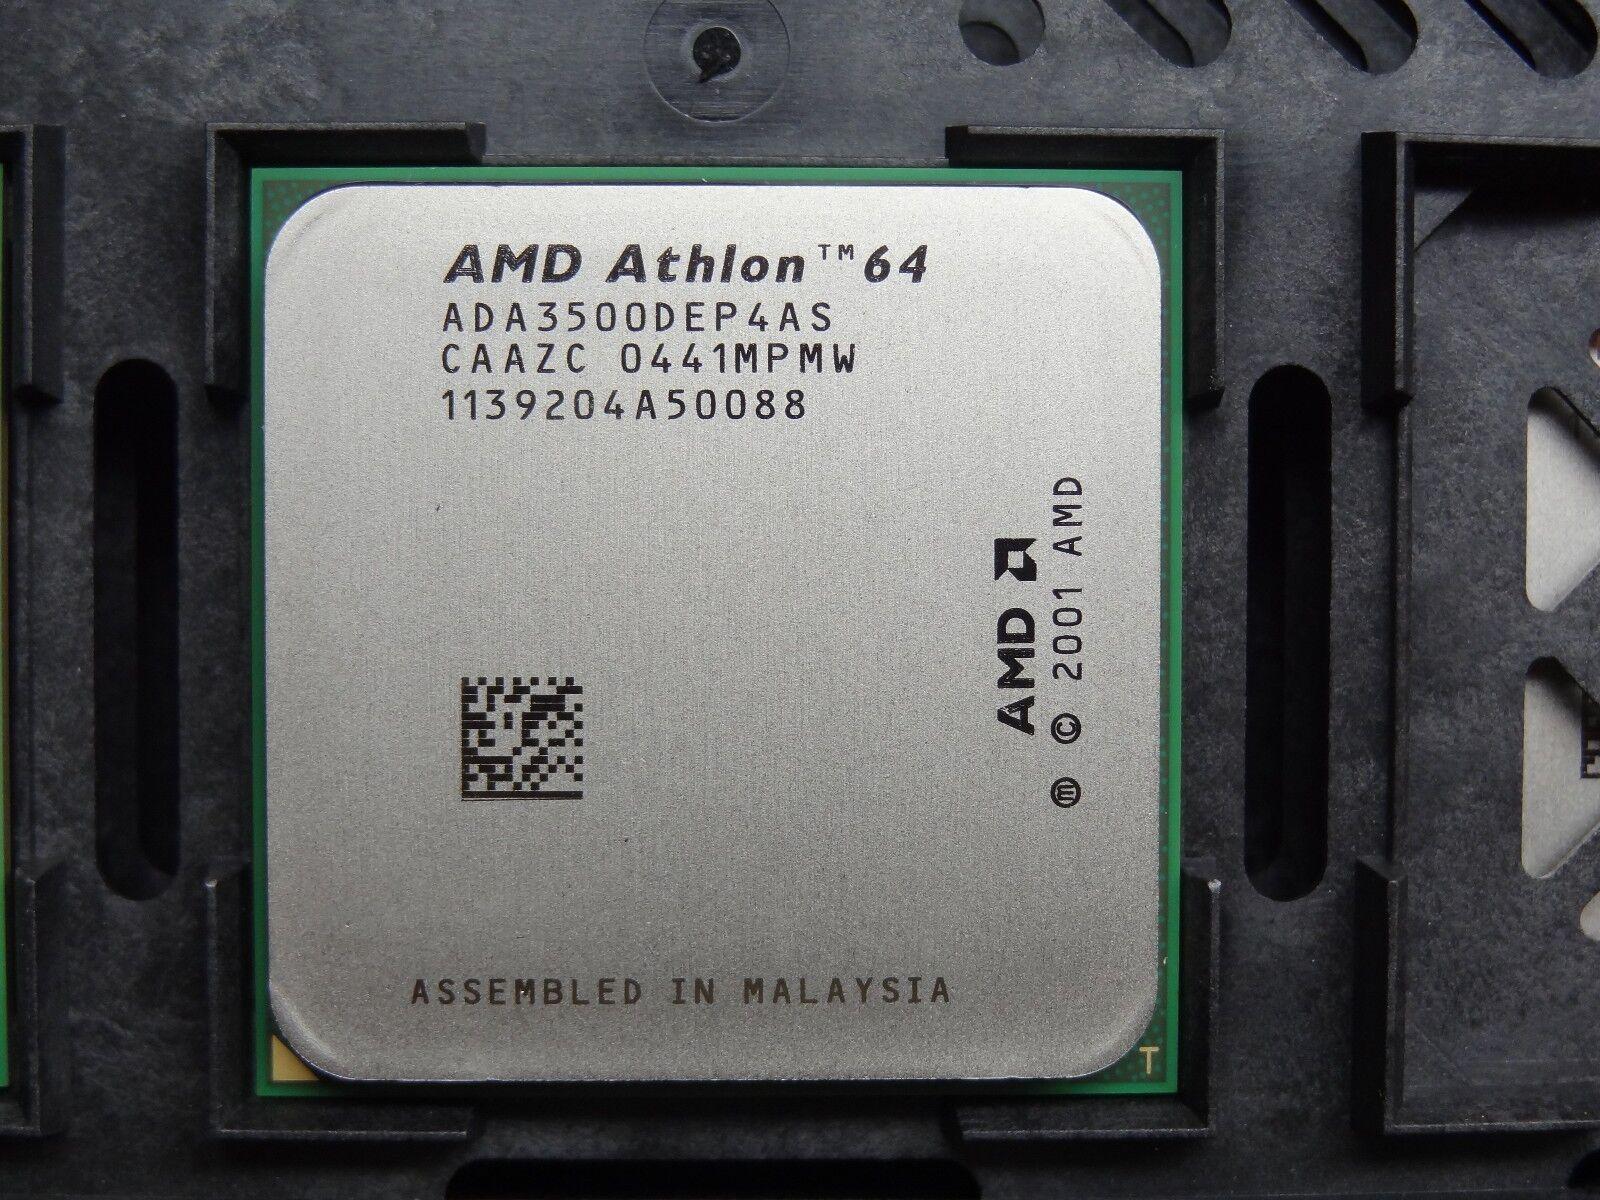 AMD Athlon 64 3500+ 2.2GHz (ADA3500DEP4AS) CPU Processor #TQ1523